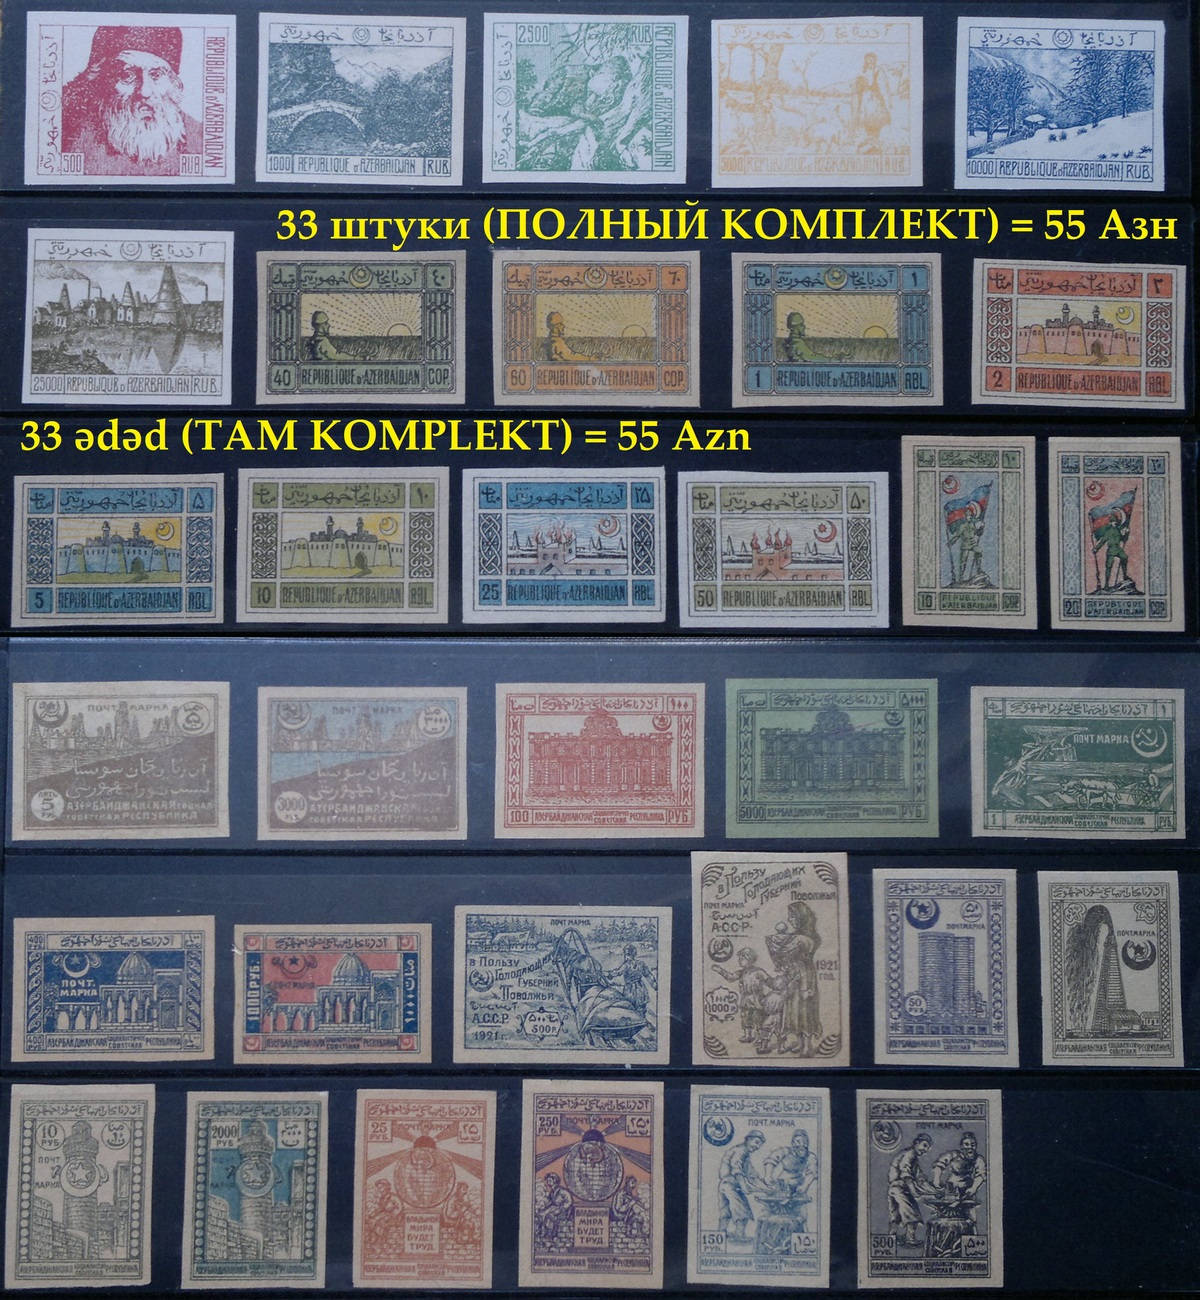 Azerbaycanin 1919-1921-ci illere aid,Cumhuriyyet dovrunun poct markalarini satiram.<br />\r\n<br />\r\n33 eded-TAM KOMPLEKT...